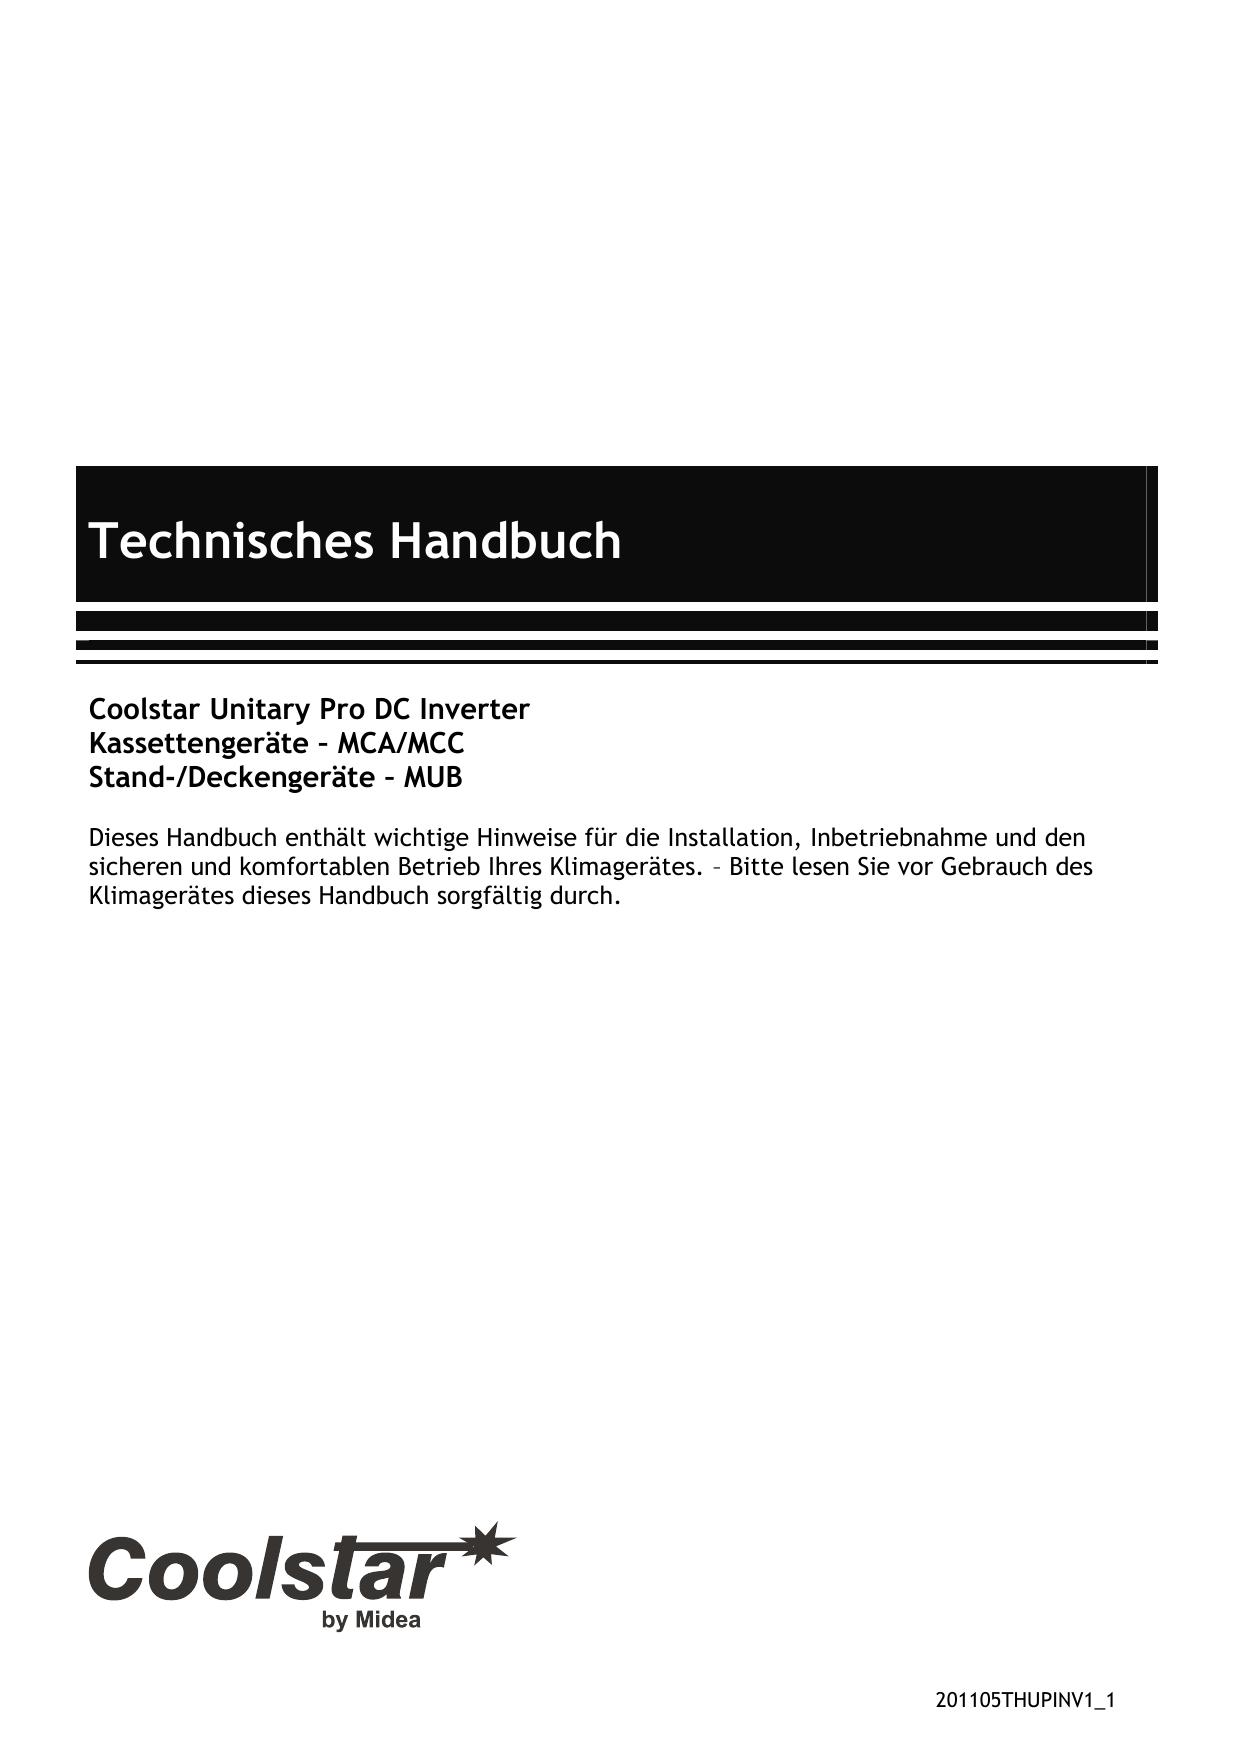 Technisches Handbuch Coolstar Unitary Pro-Inverter | manualzz.com